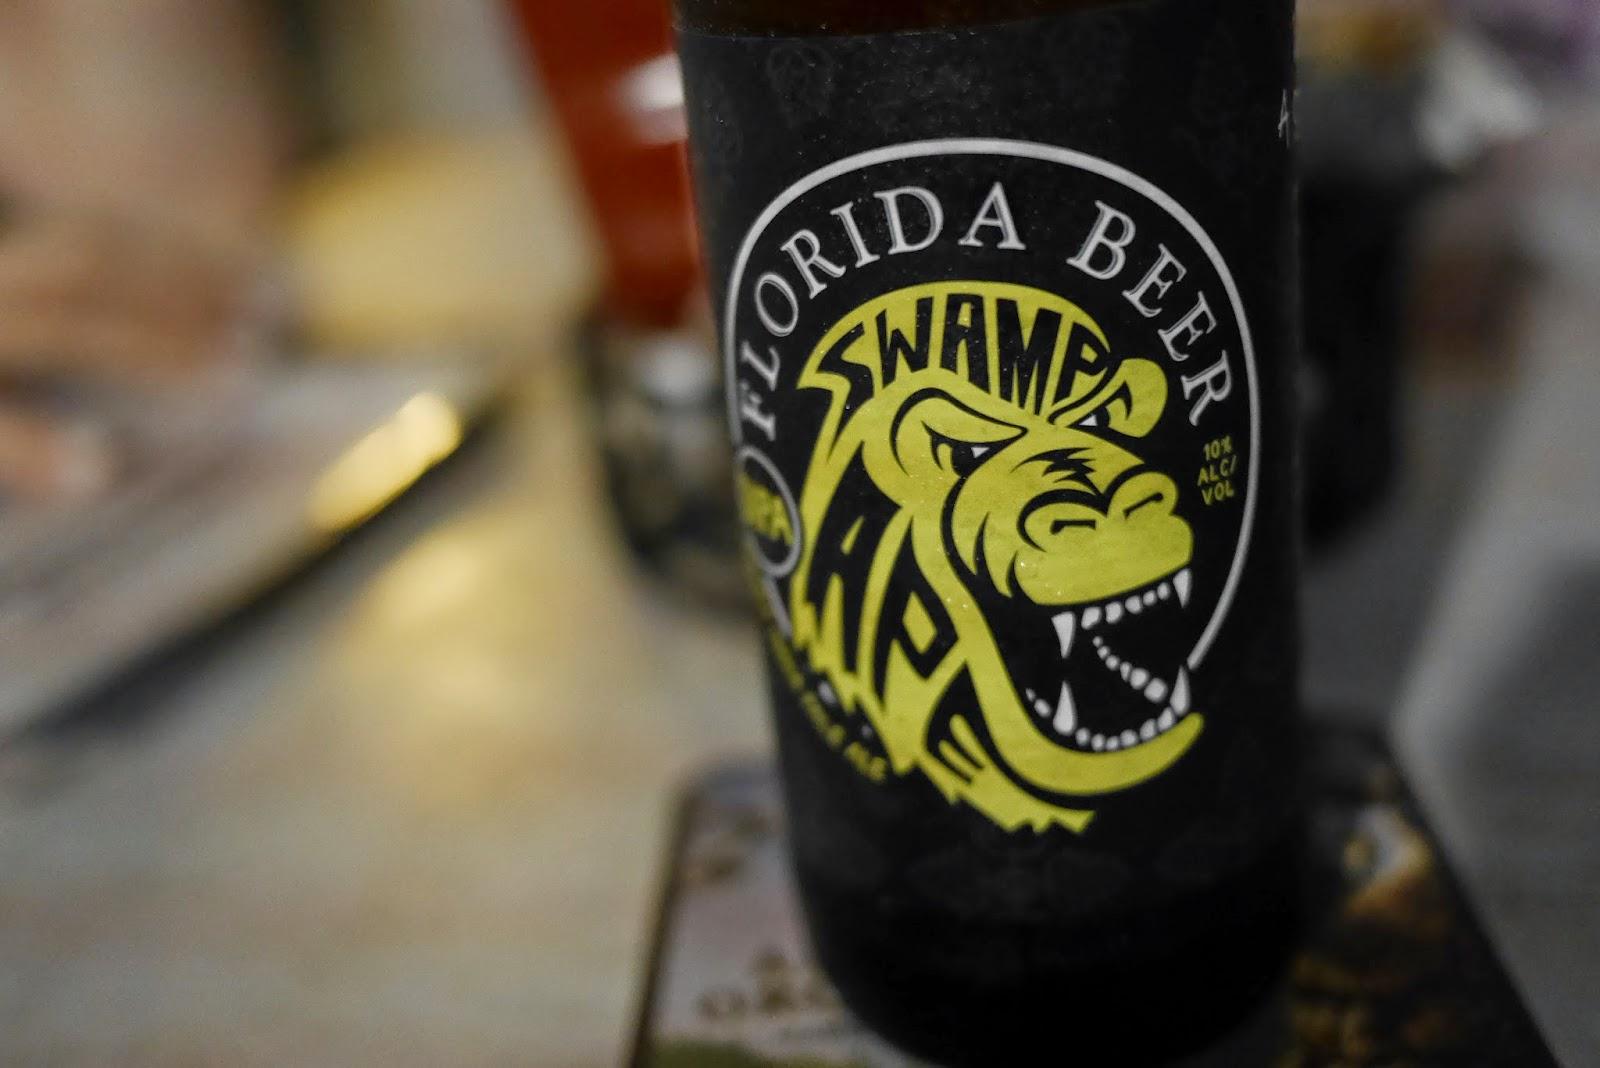 swamp ape ipa florida beer company, celebration town tavern orlando florida